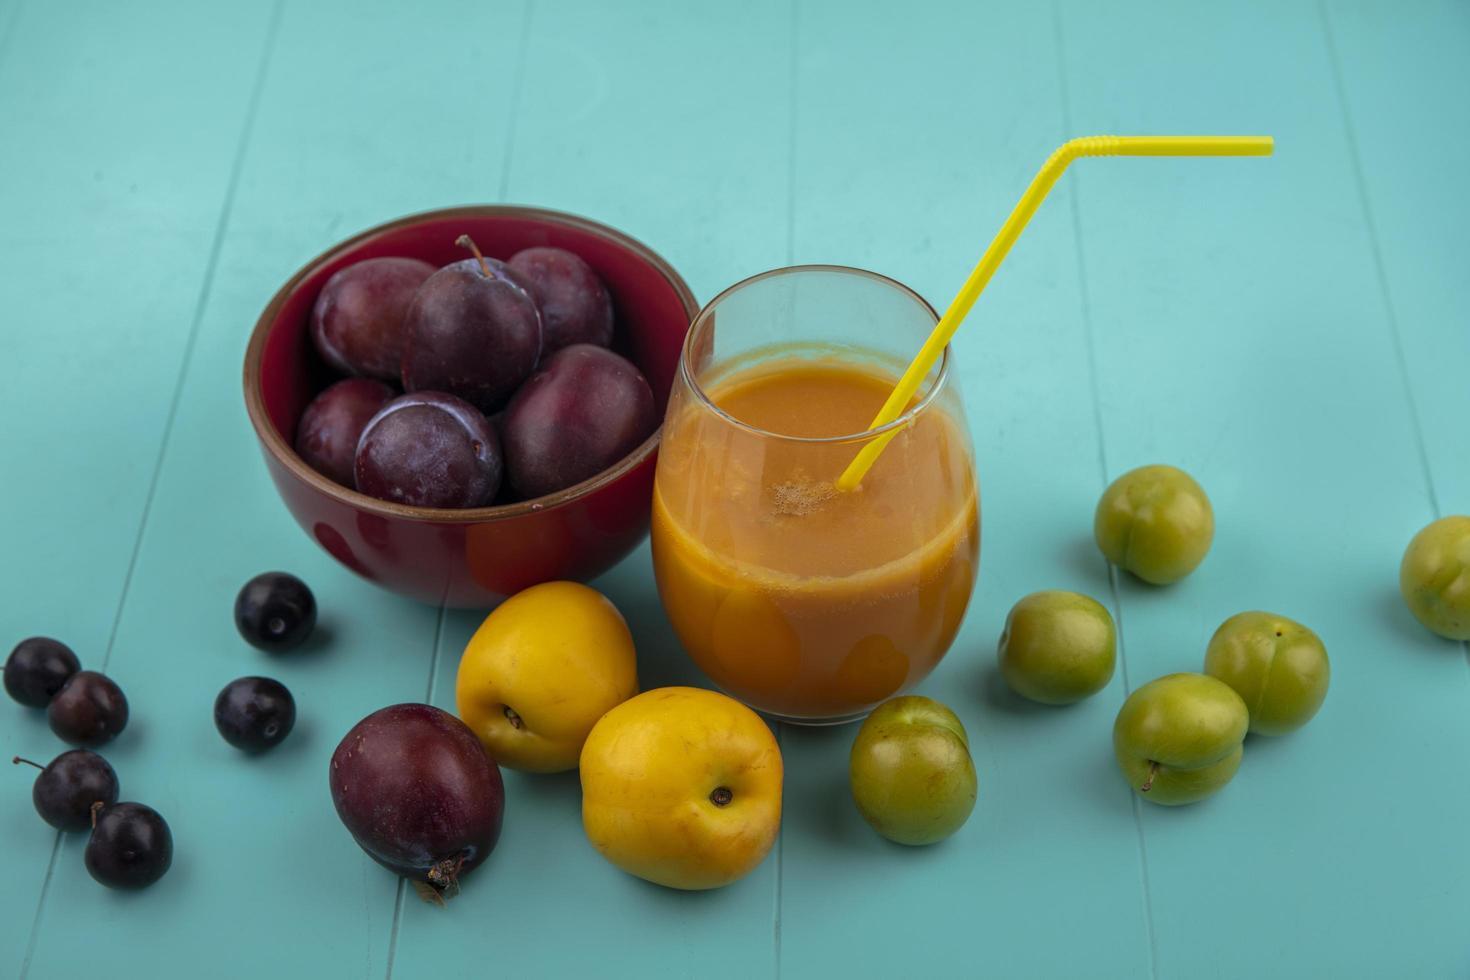 vers fruit en sap op blauwe achtergrond foto